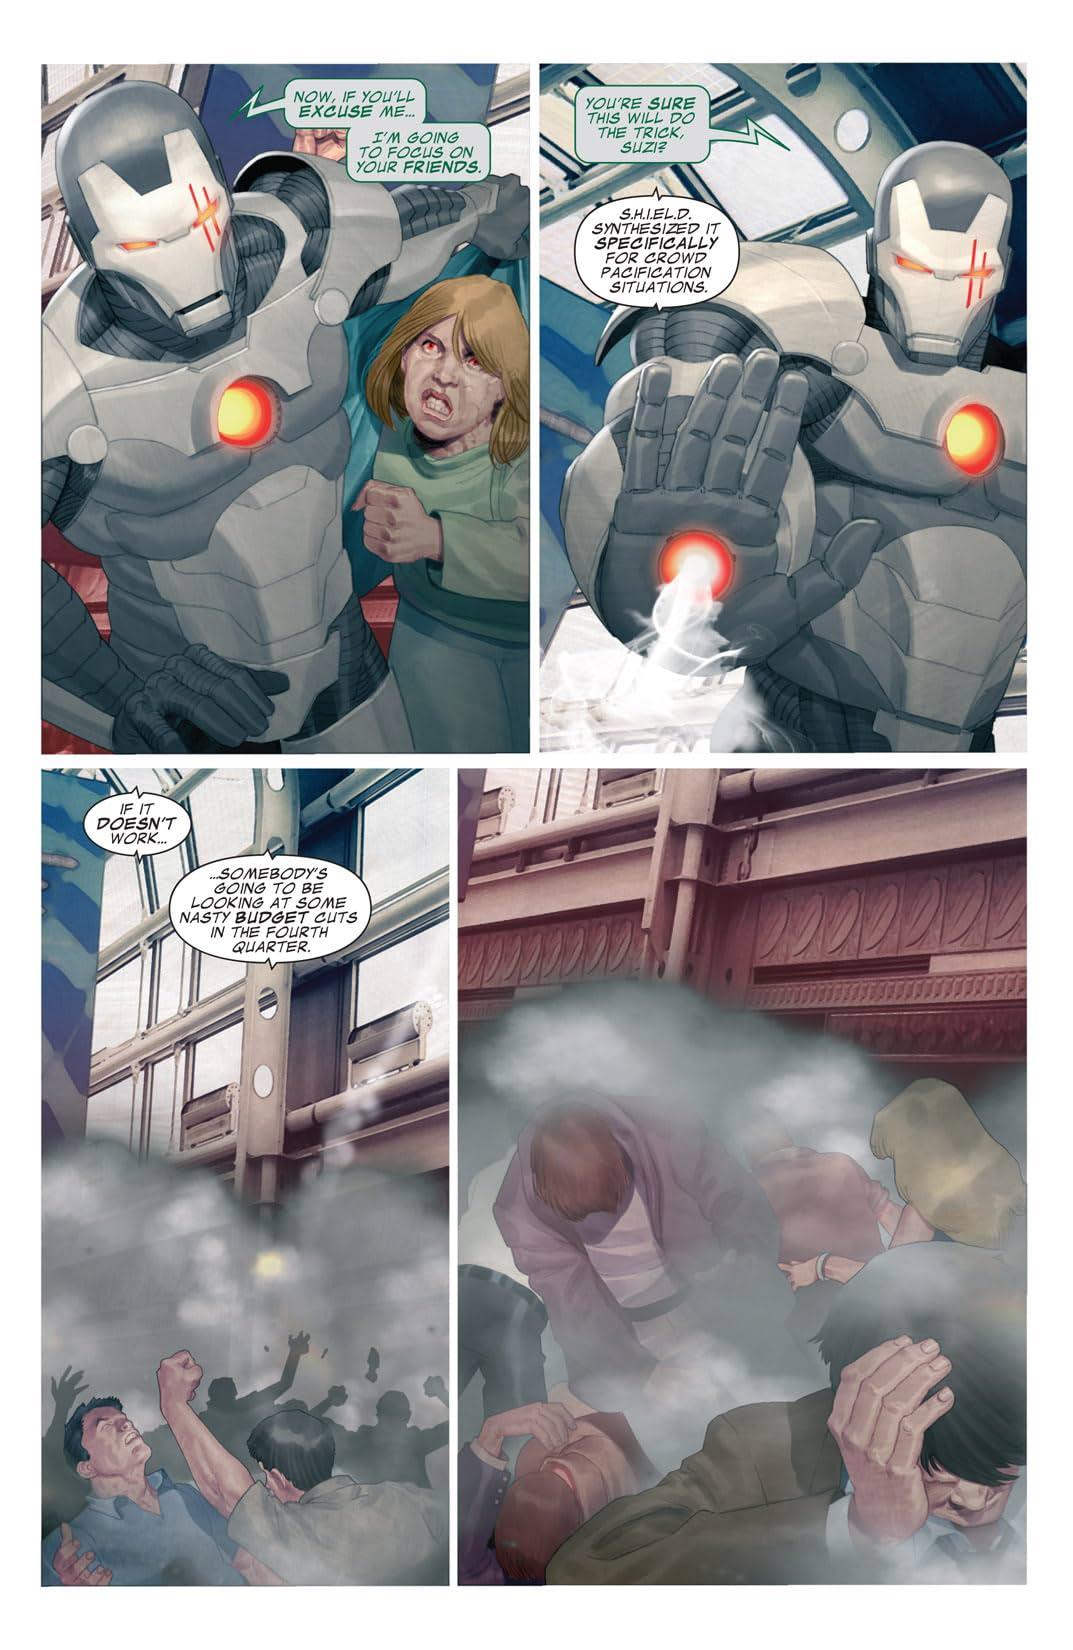 Iron Man 2.0 #11